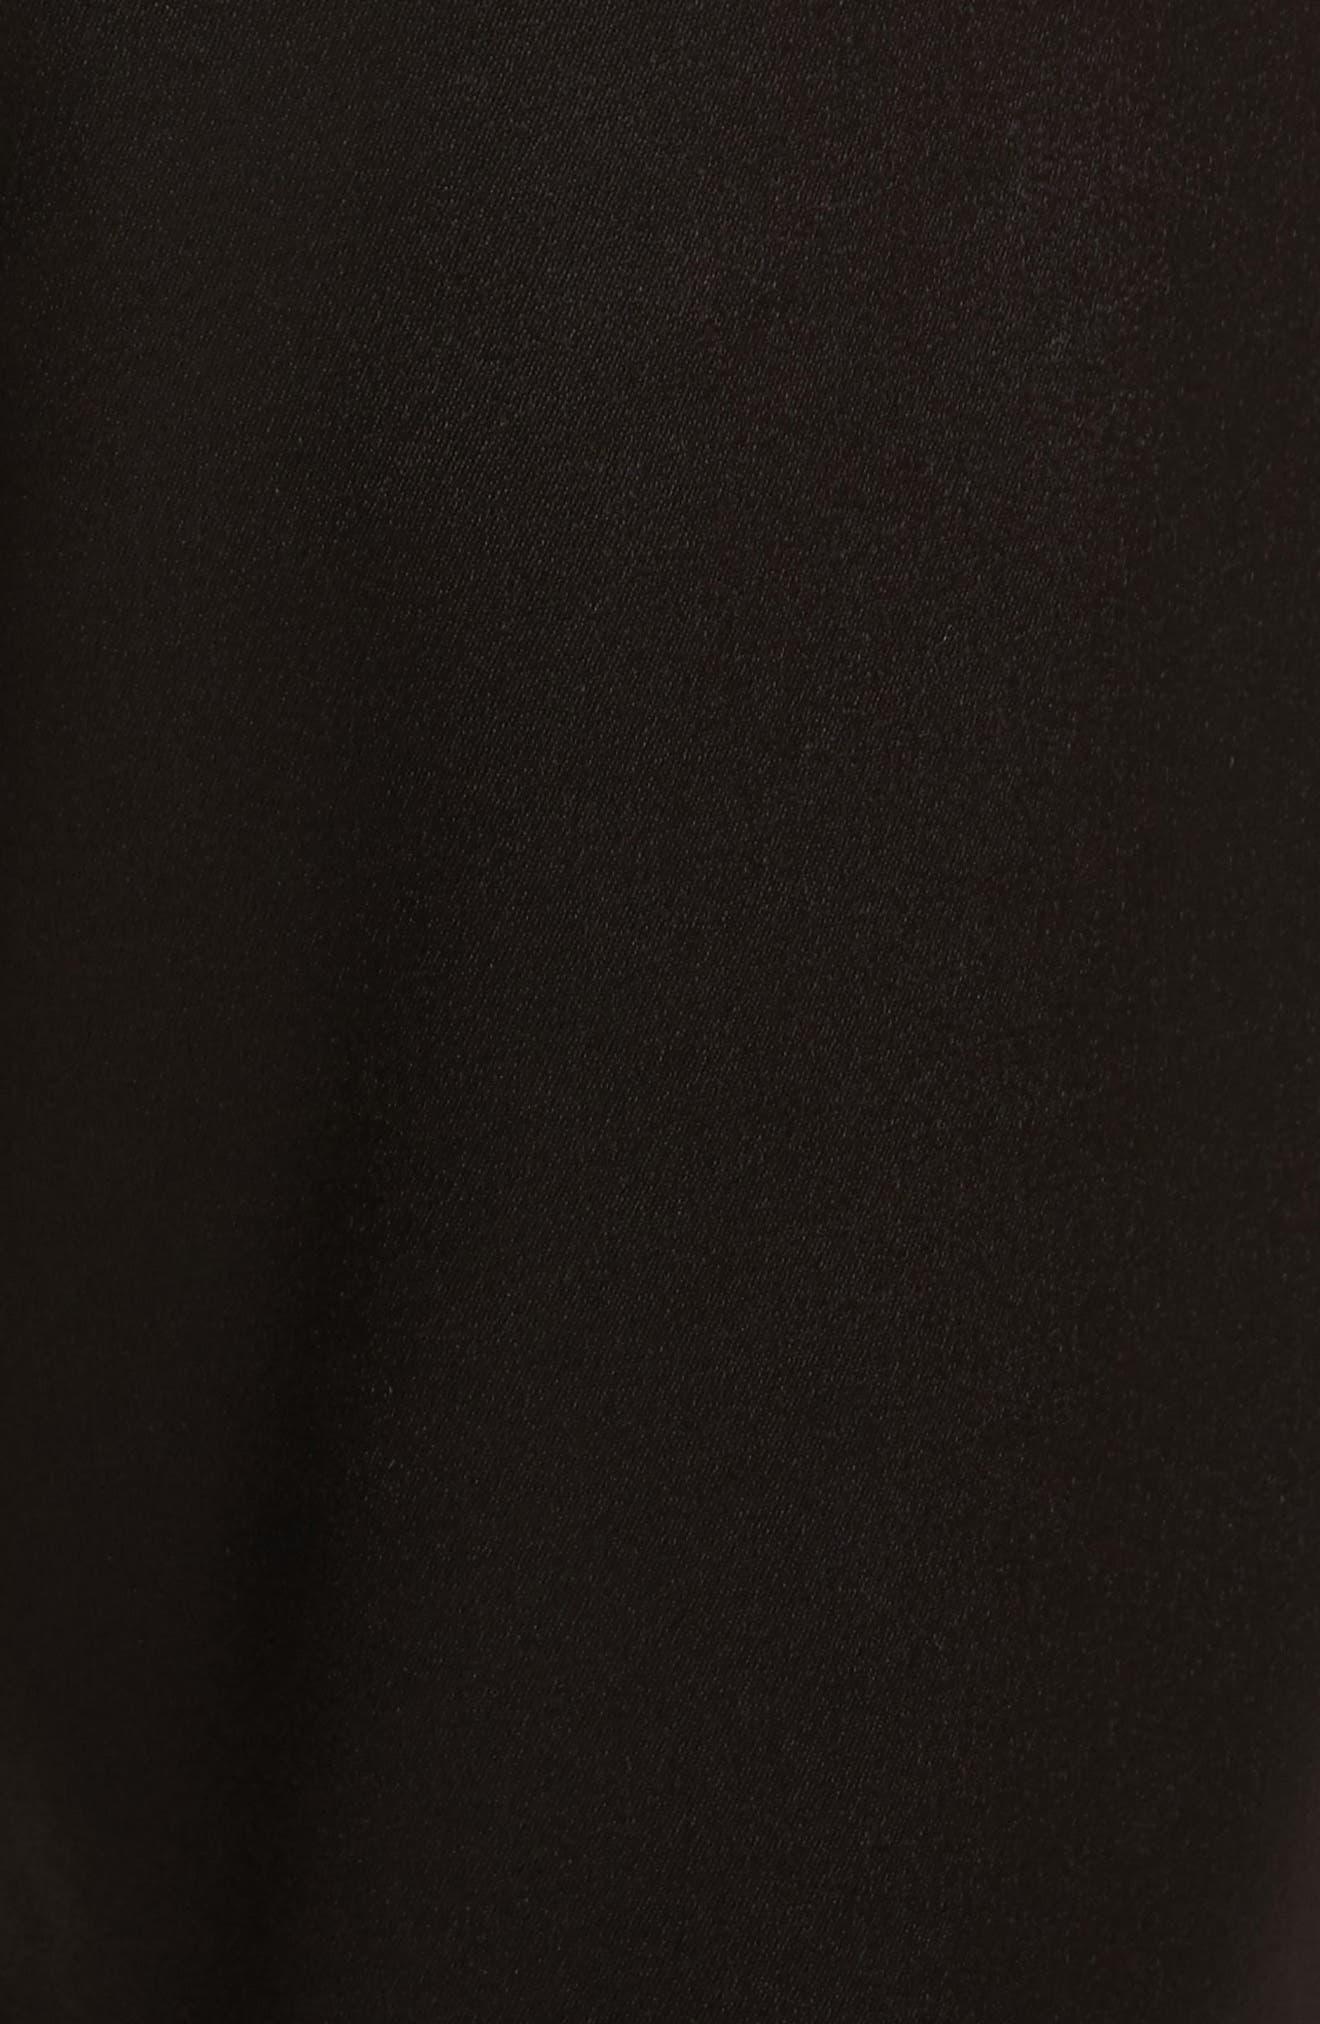 Pete Embellished Side Jogger Pants,                             Alternate thumbnail 5, color,                             001